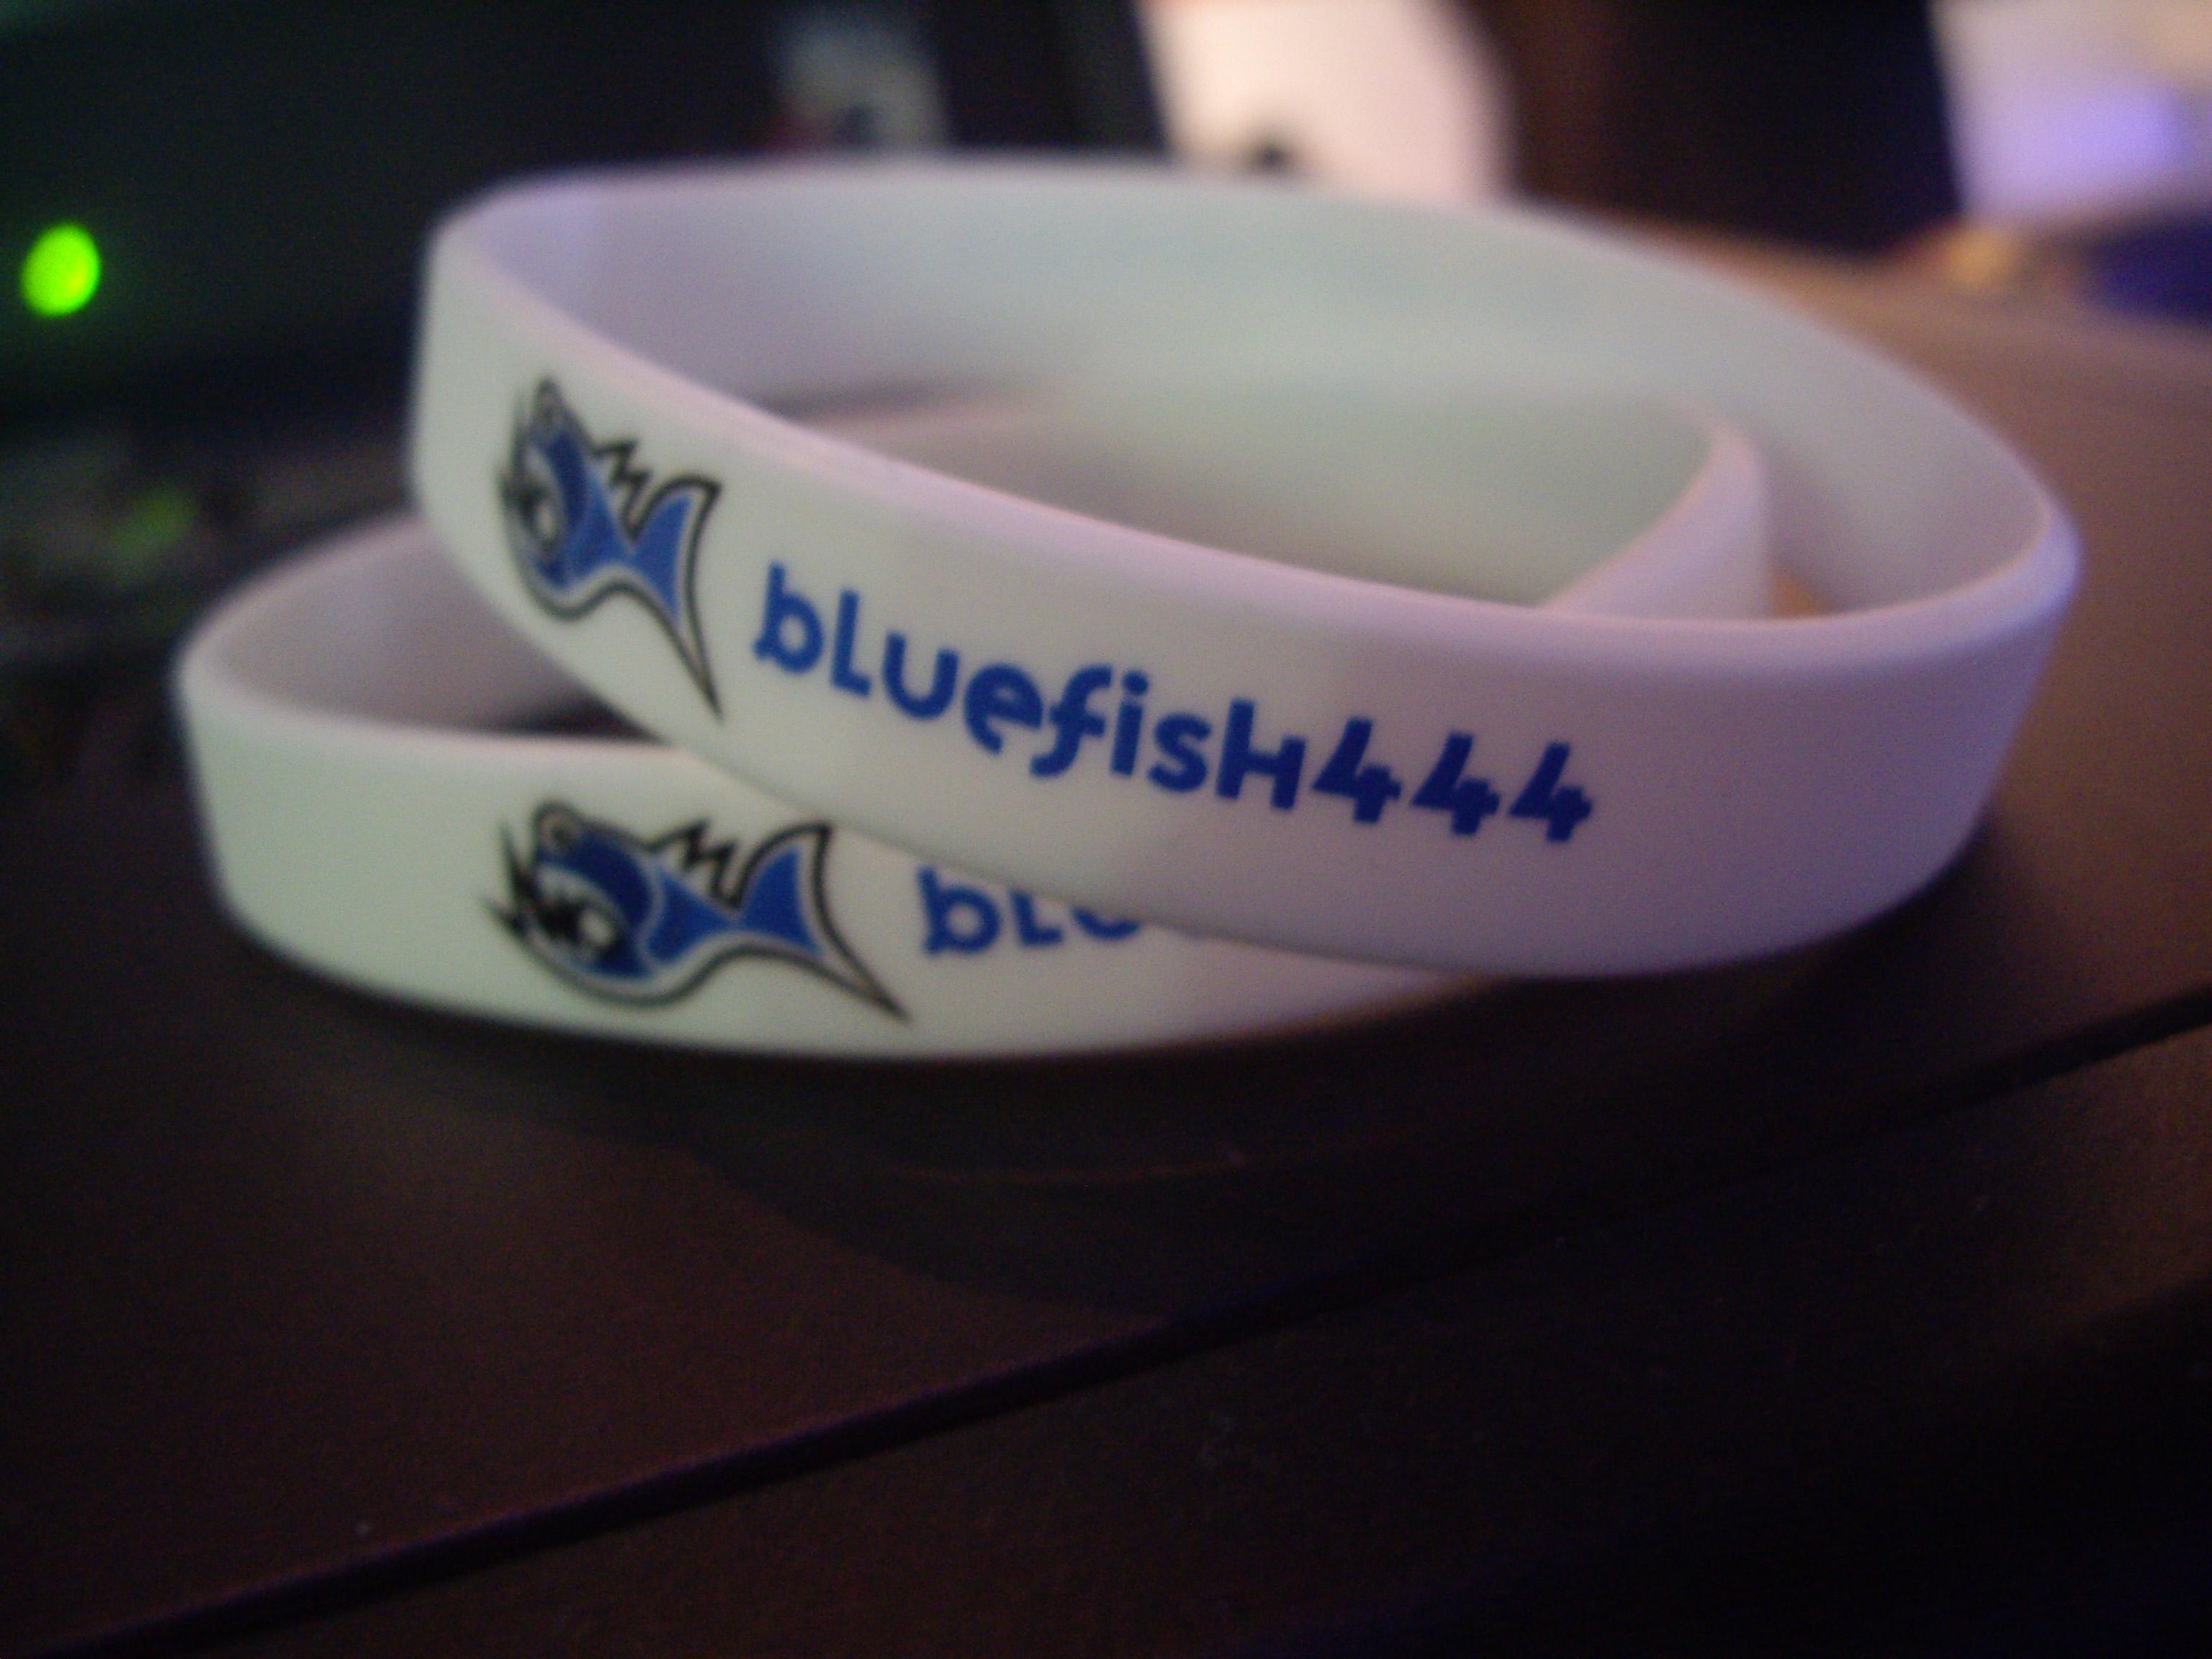 Bluefish444 Wrist Bands